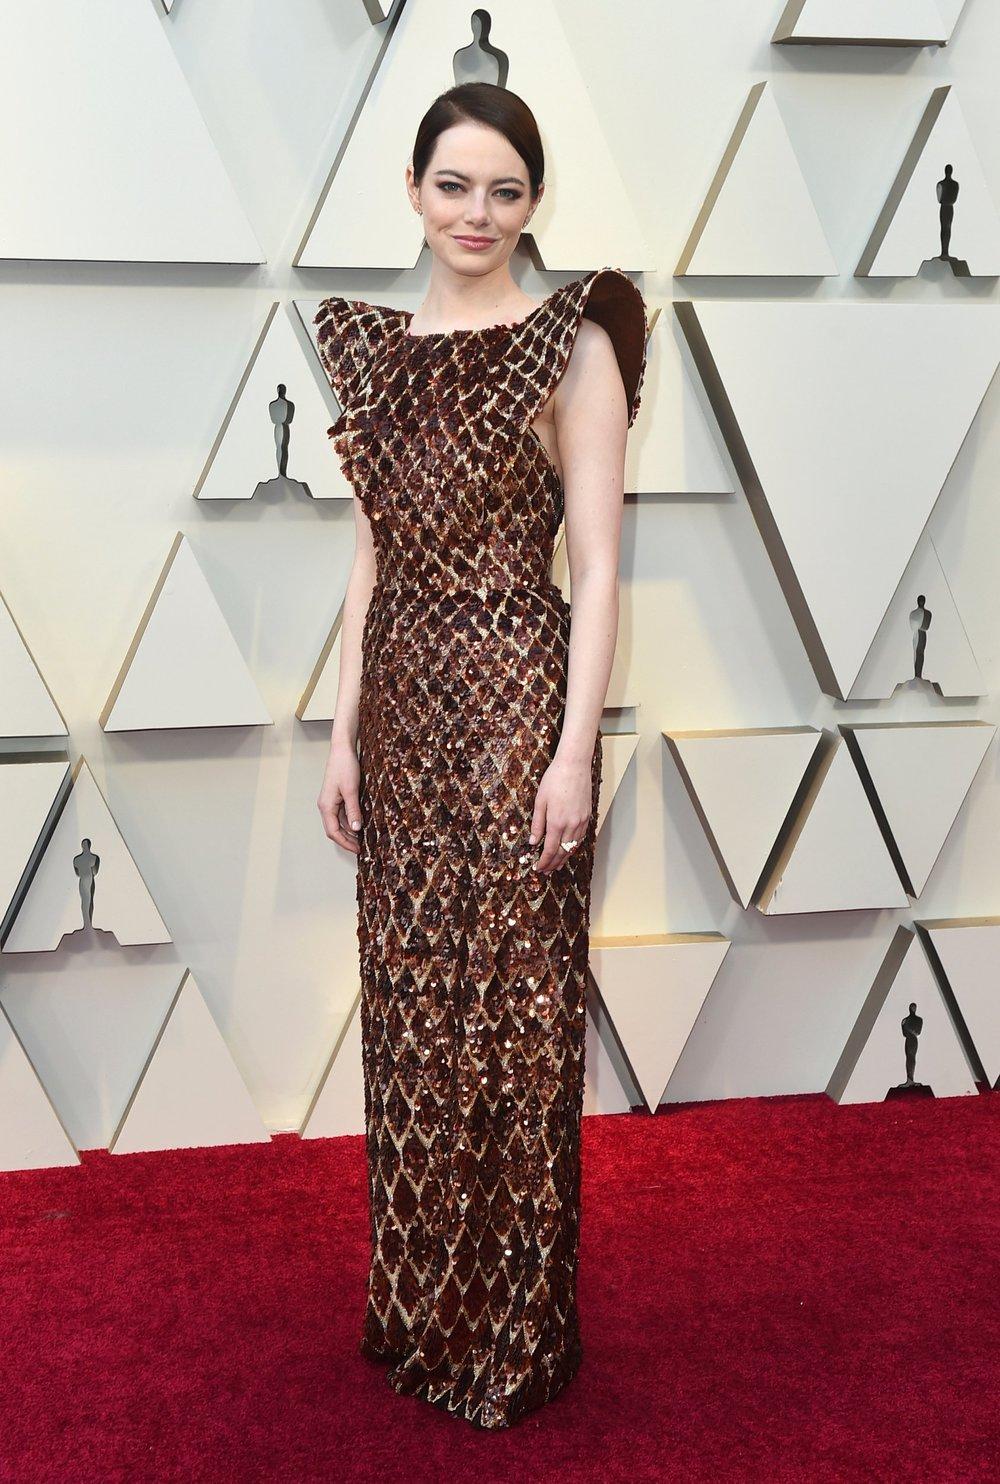 BestDressed-Oscars-2-24-19-80.jpg